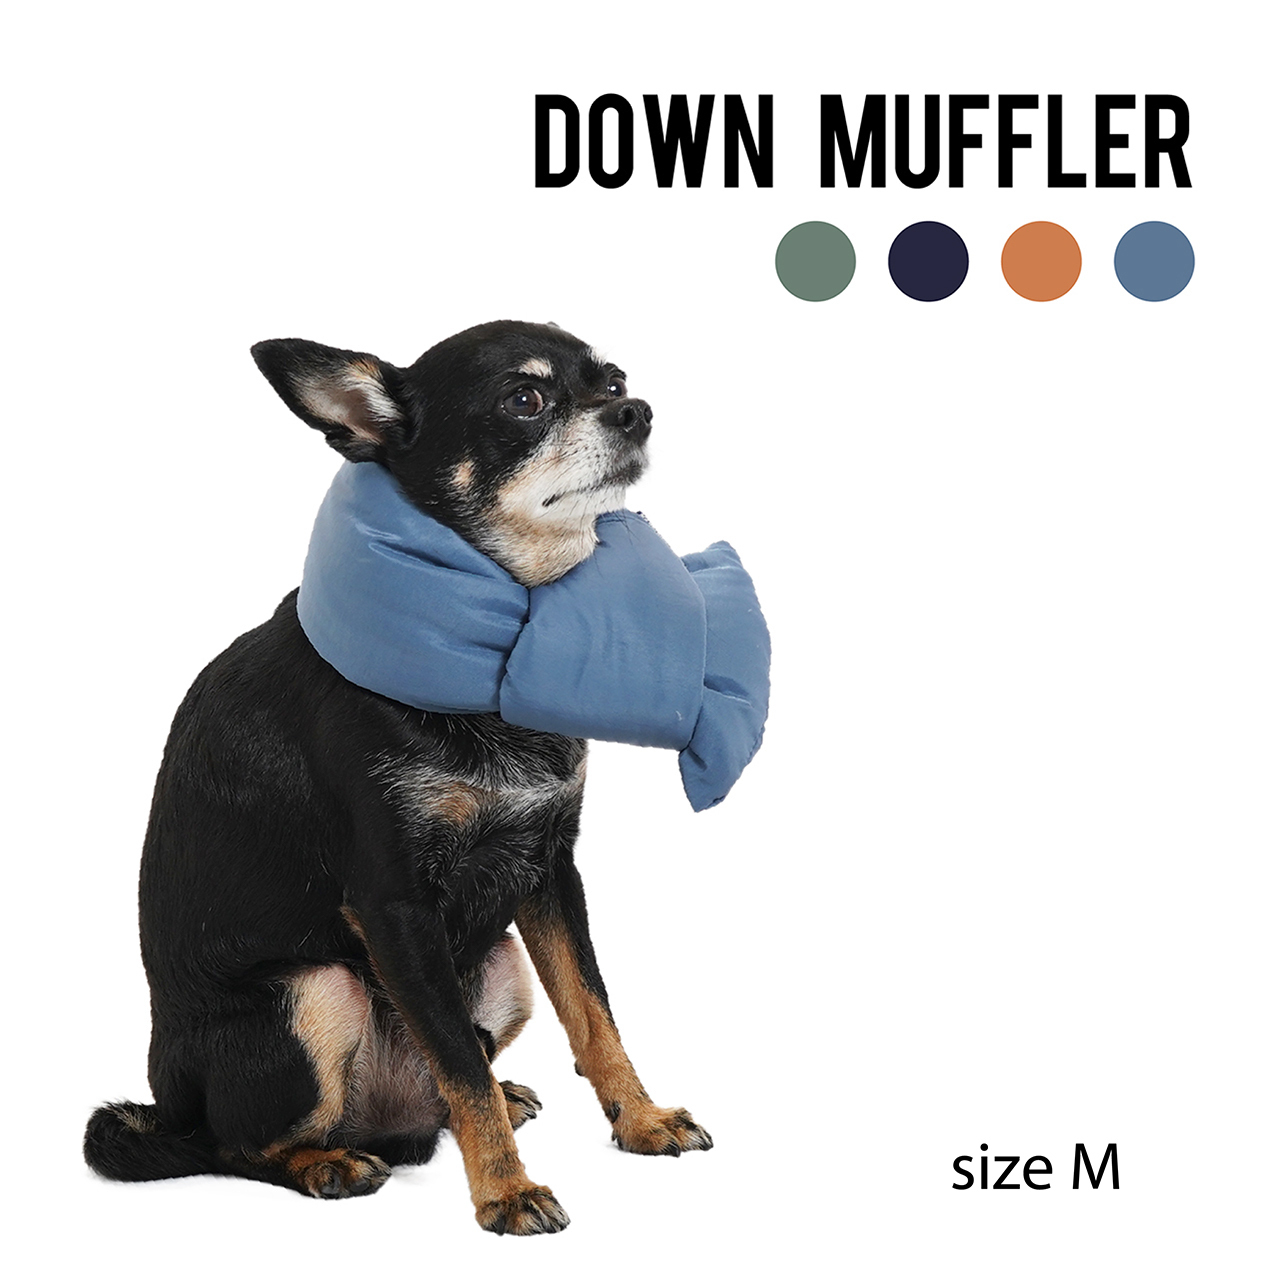 DOWN MUFFLER M ダウンマフラーMサイズ